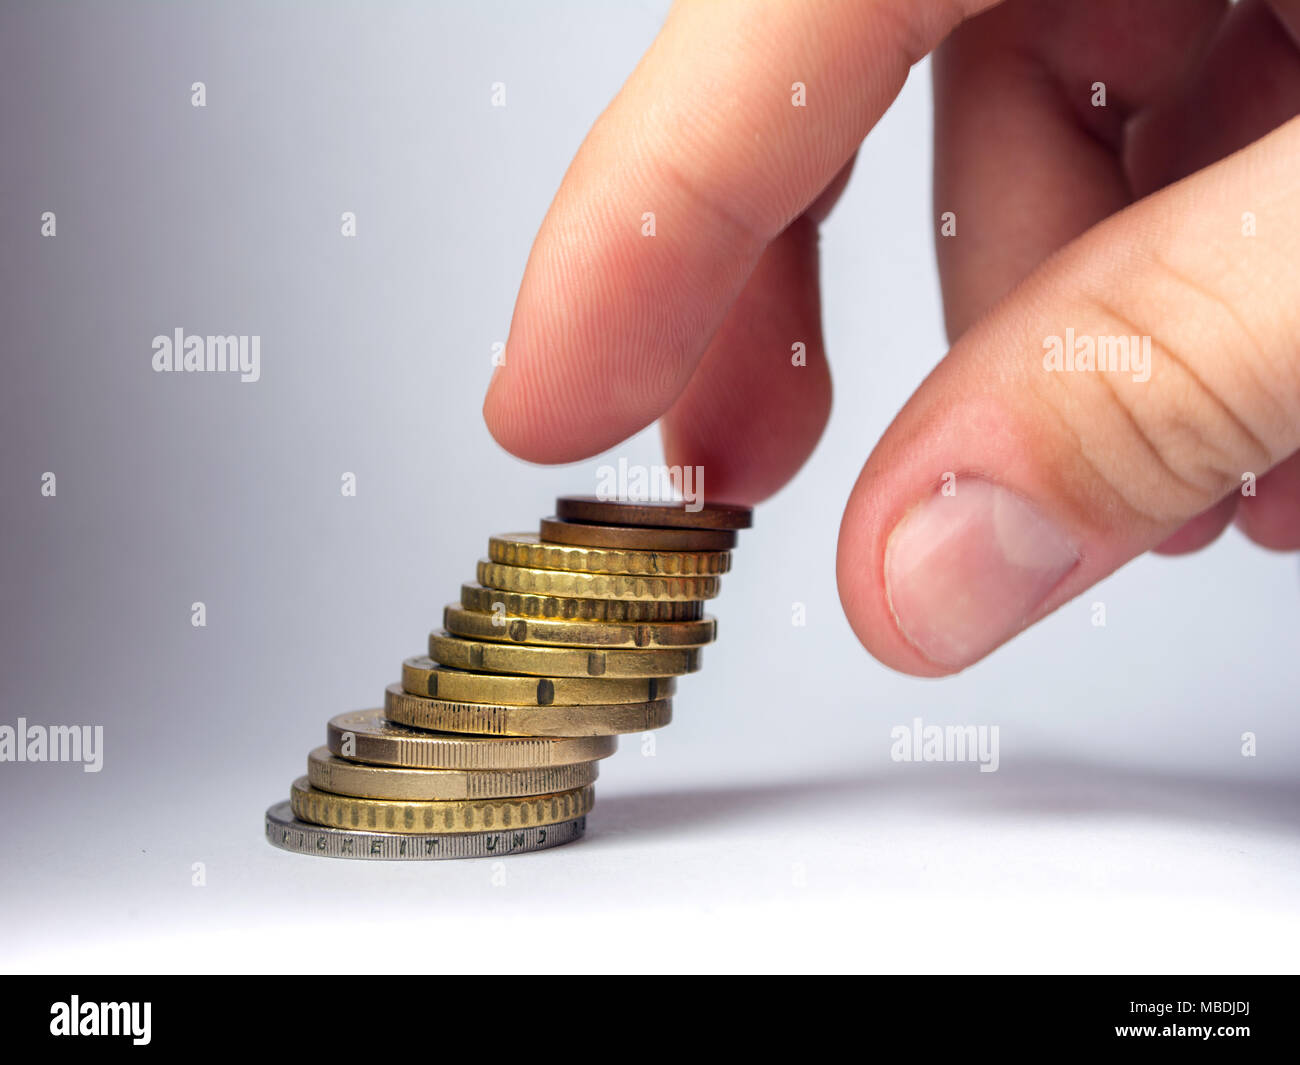 Geld gespart. Stockbild